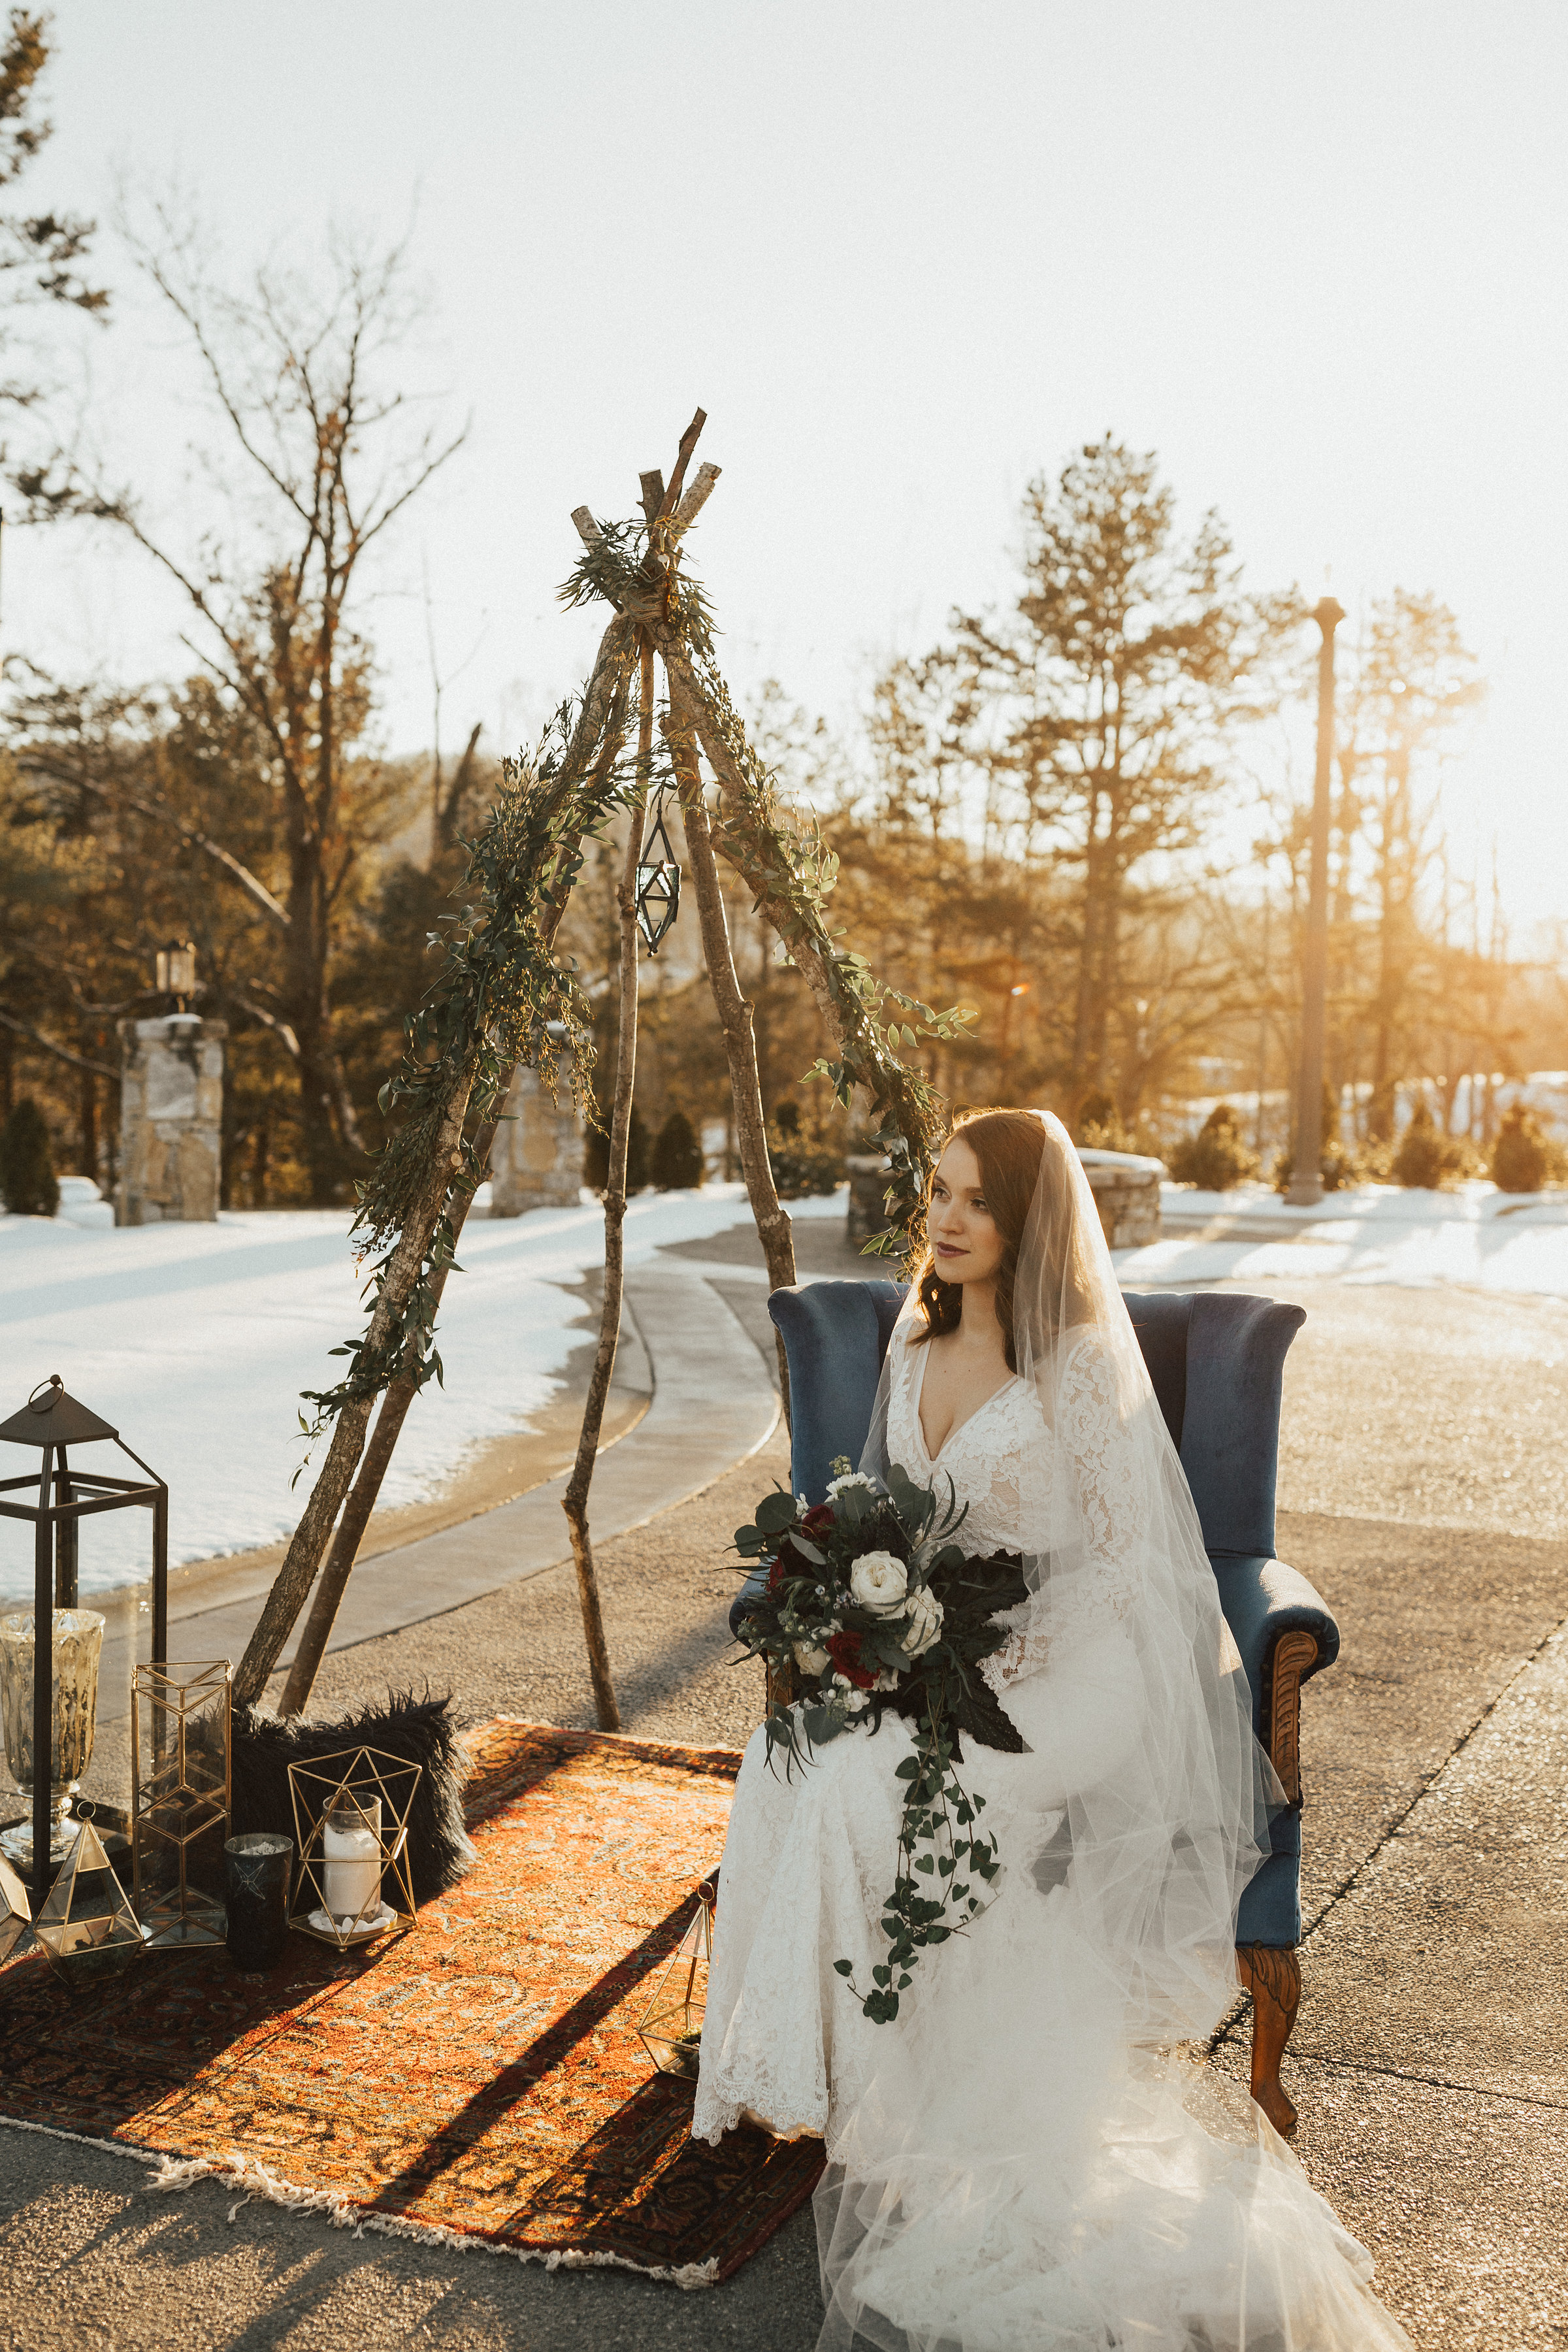 Joy-Unscripted-Wedding-Styled-Shoot-Celestial-Winter-74.jpg